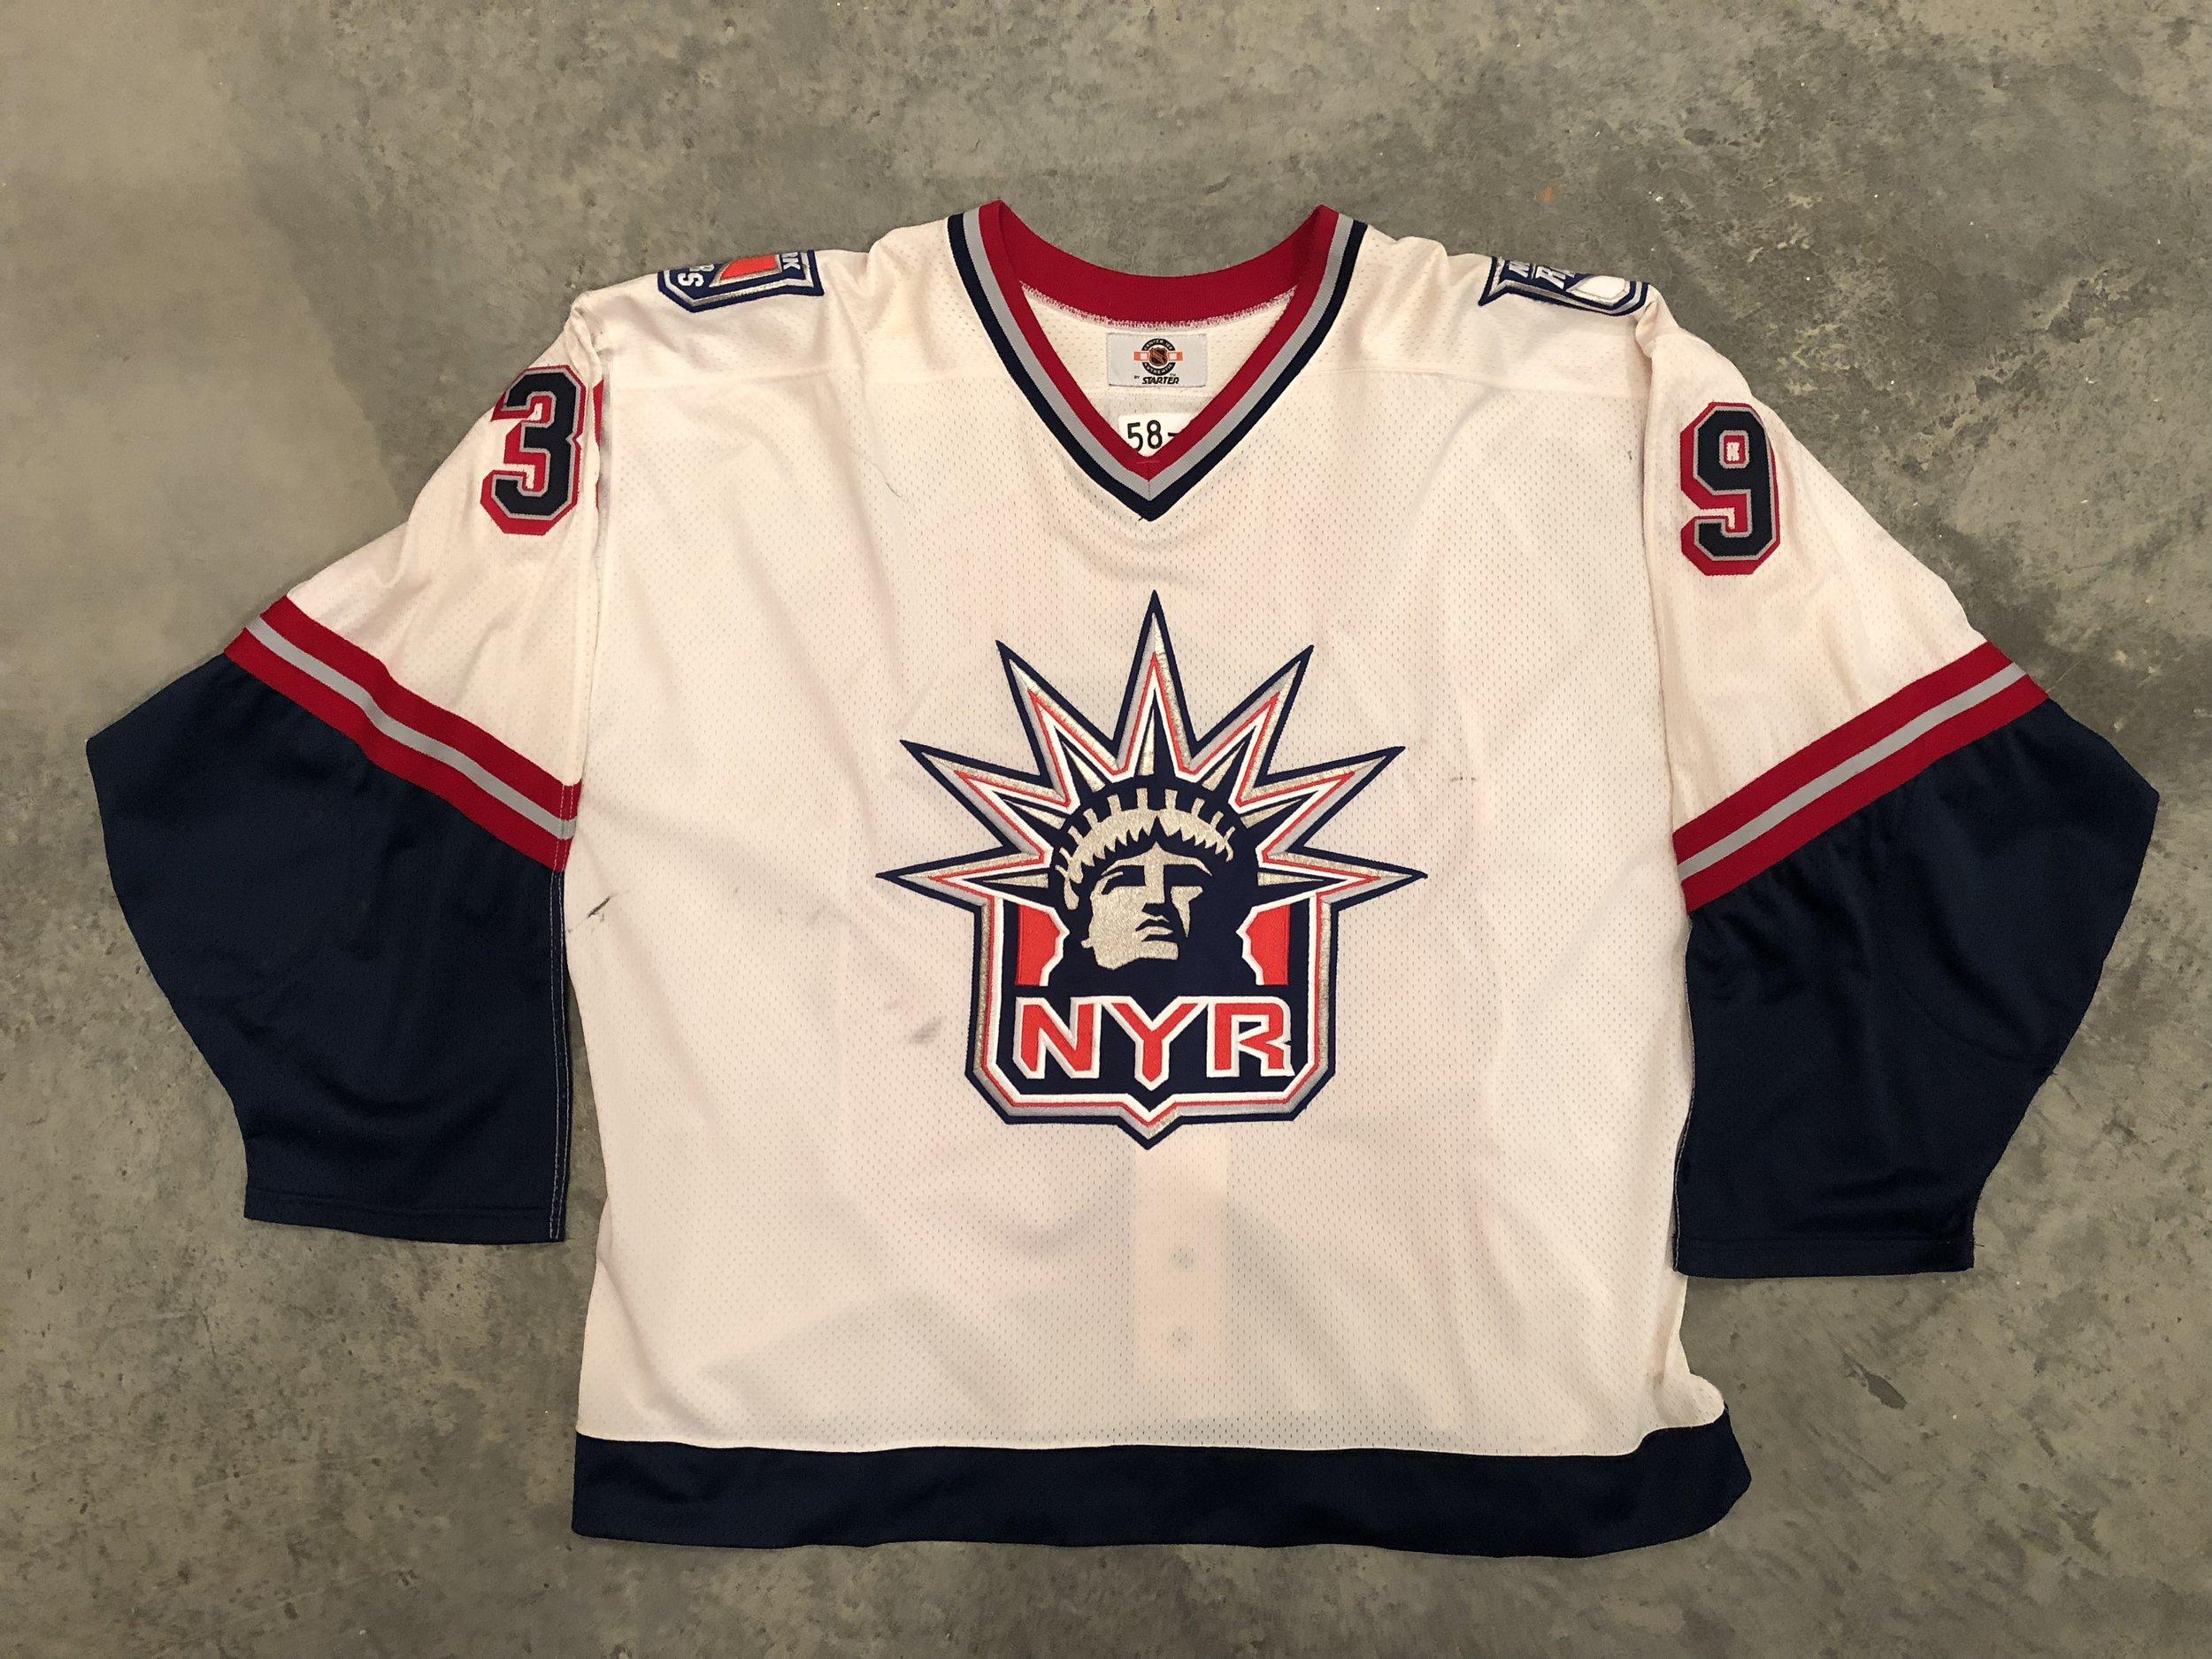 1998-99 Dan Cloutier Game Worn White Liberty Jersey